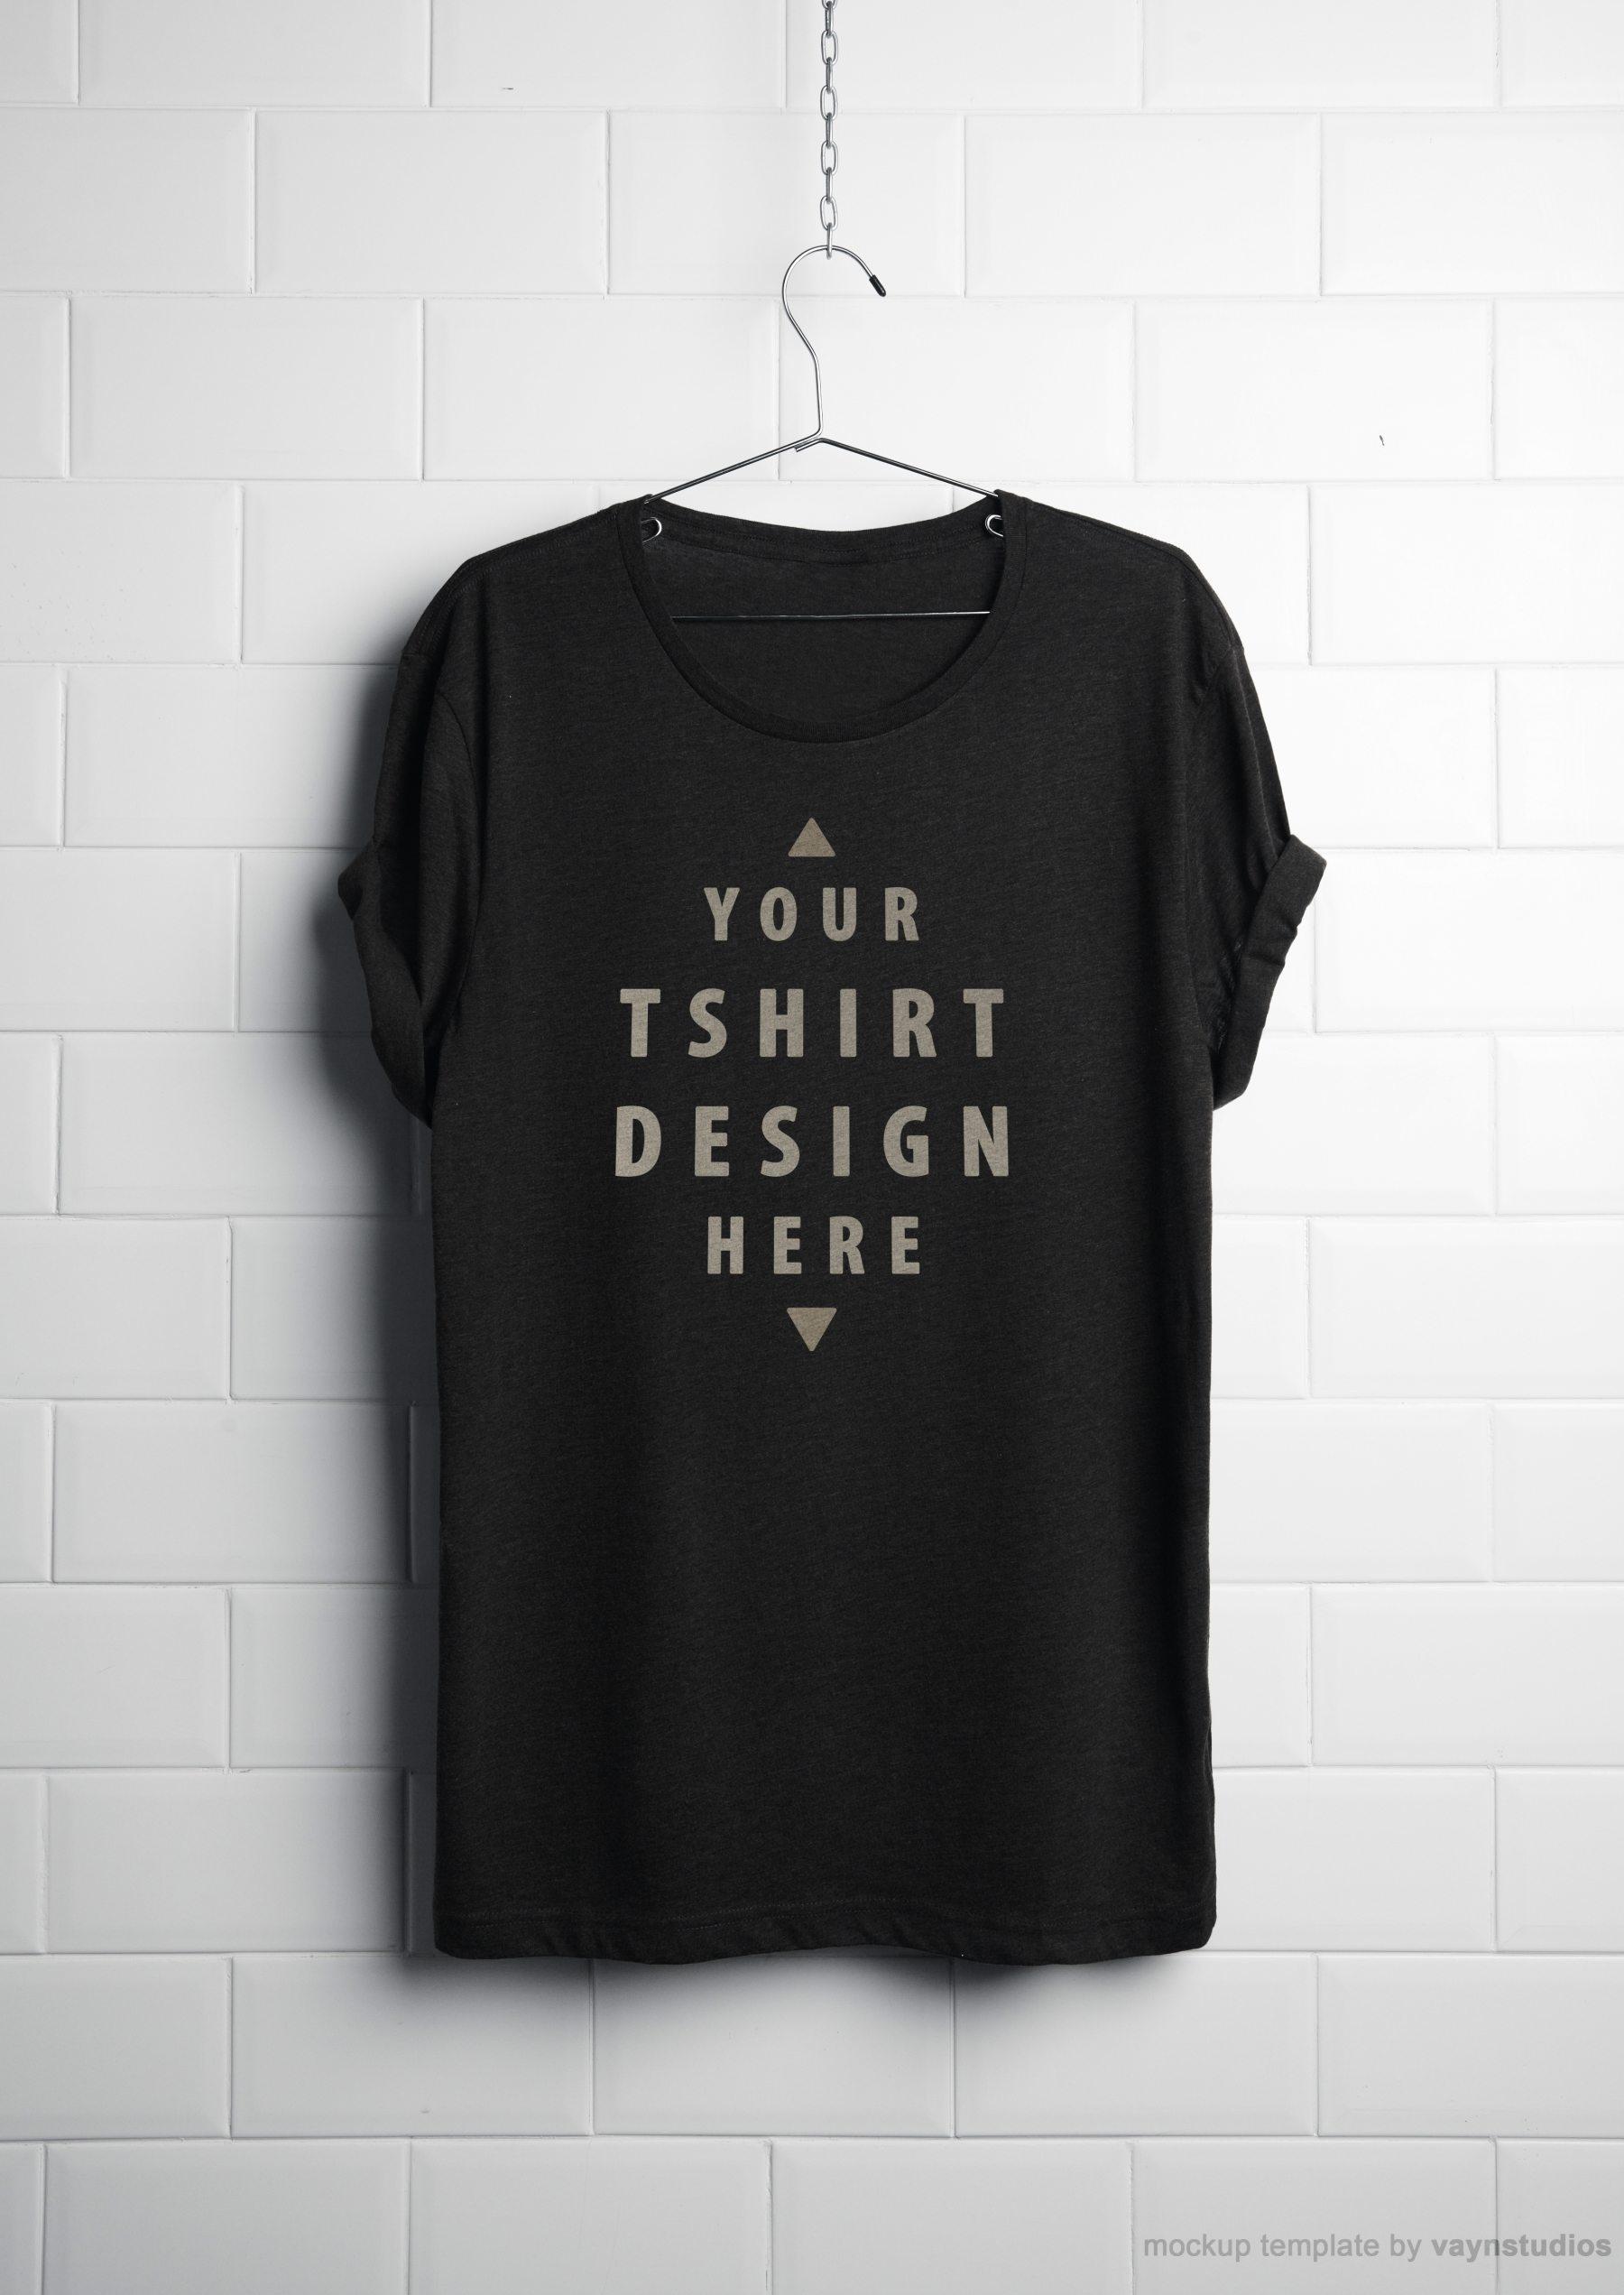 c7da1aaef674462 - 潮流印花短袖T恤衣架悬挂上装样机